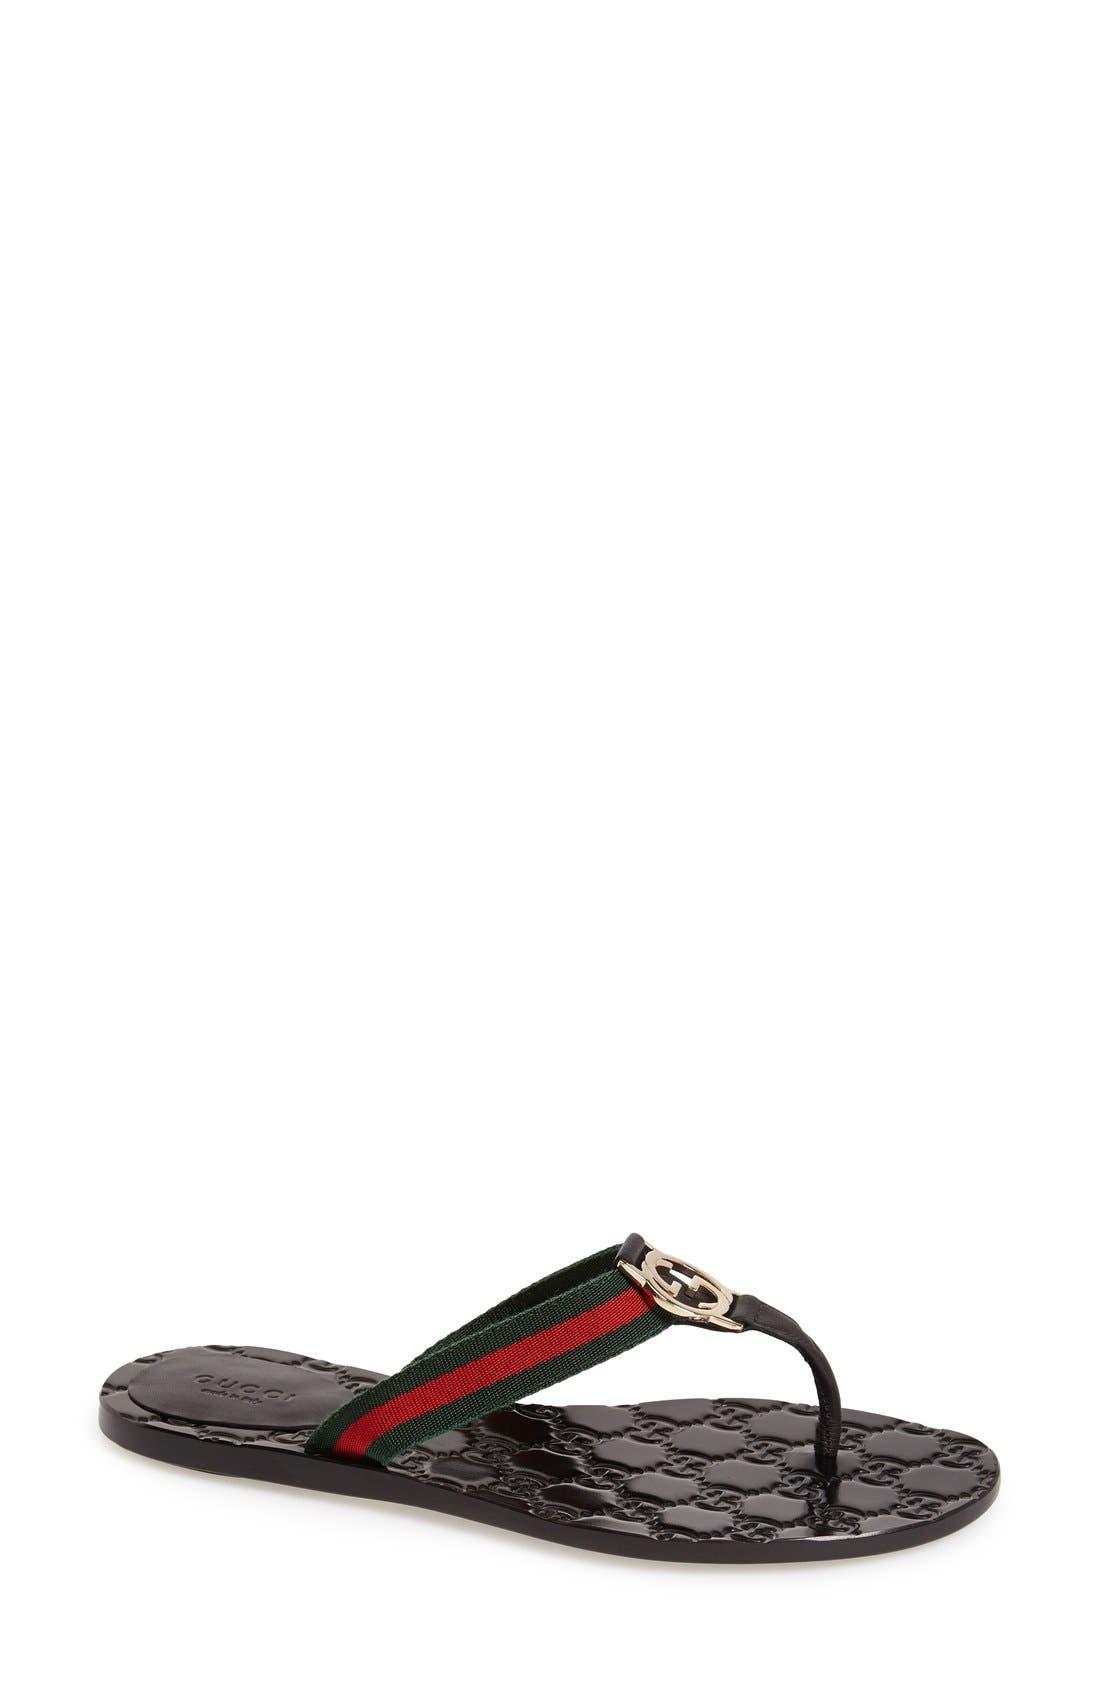 gucci shoes. gucci \u0027gg\u0027 logo sandal shoes p